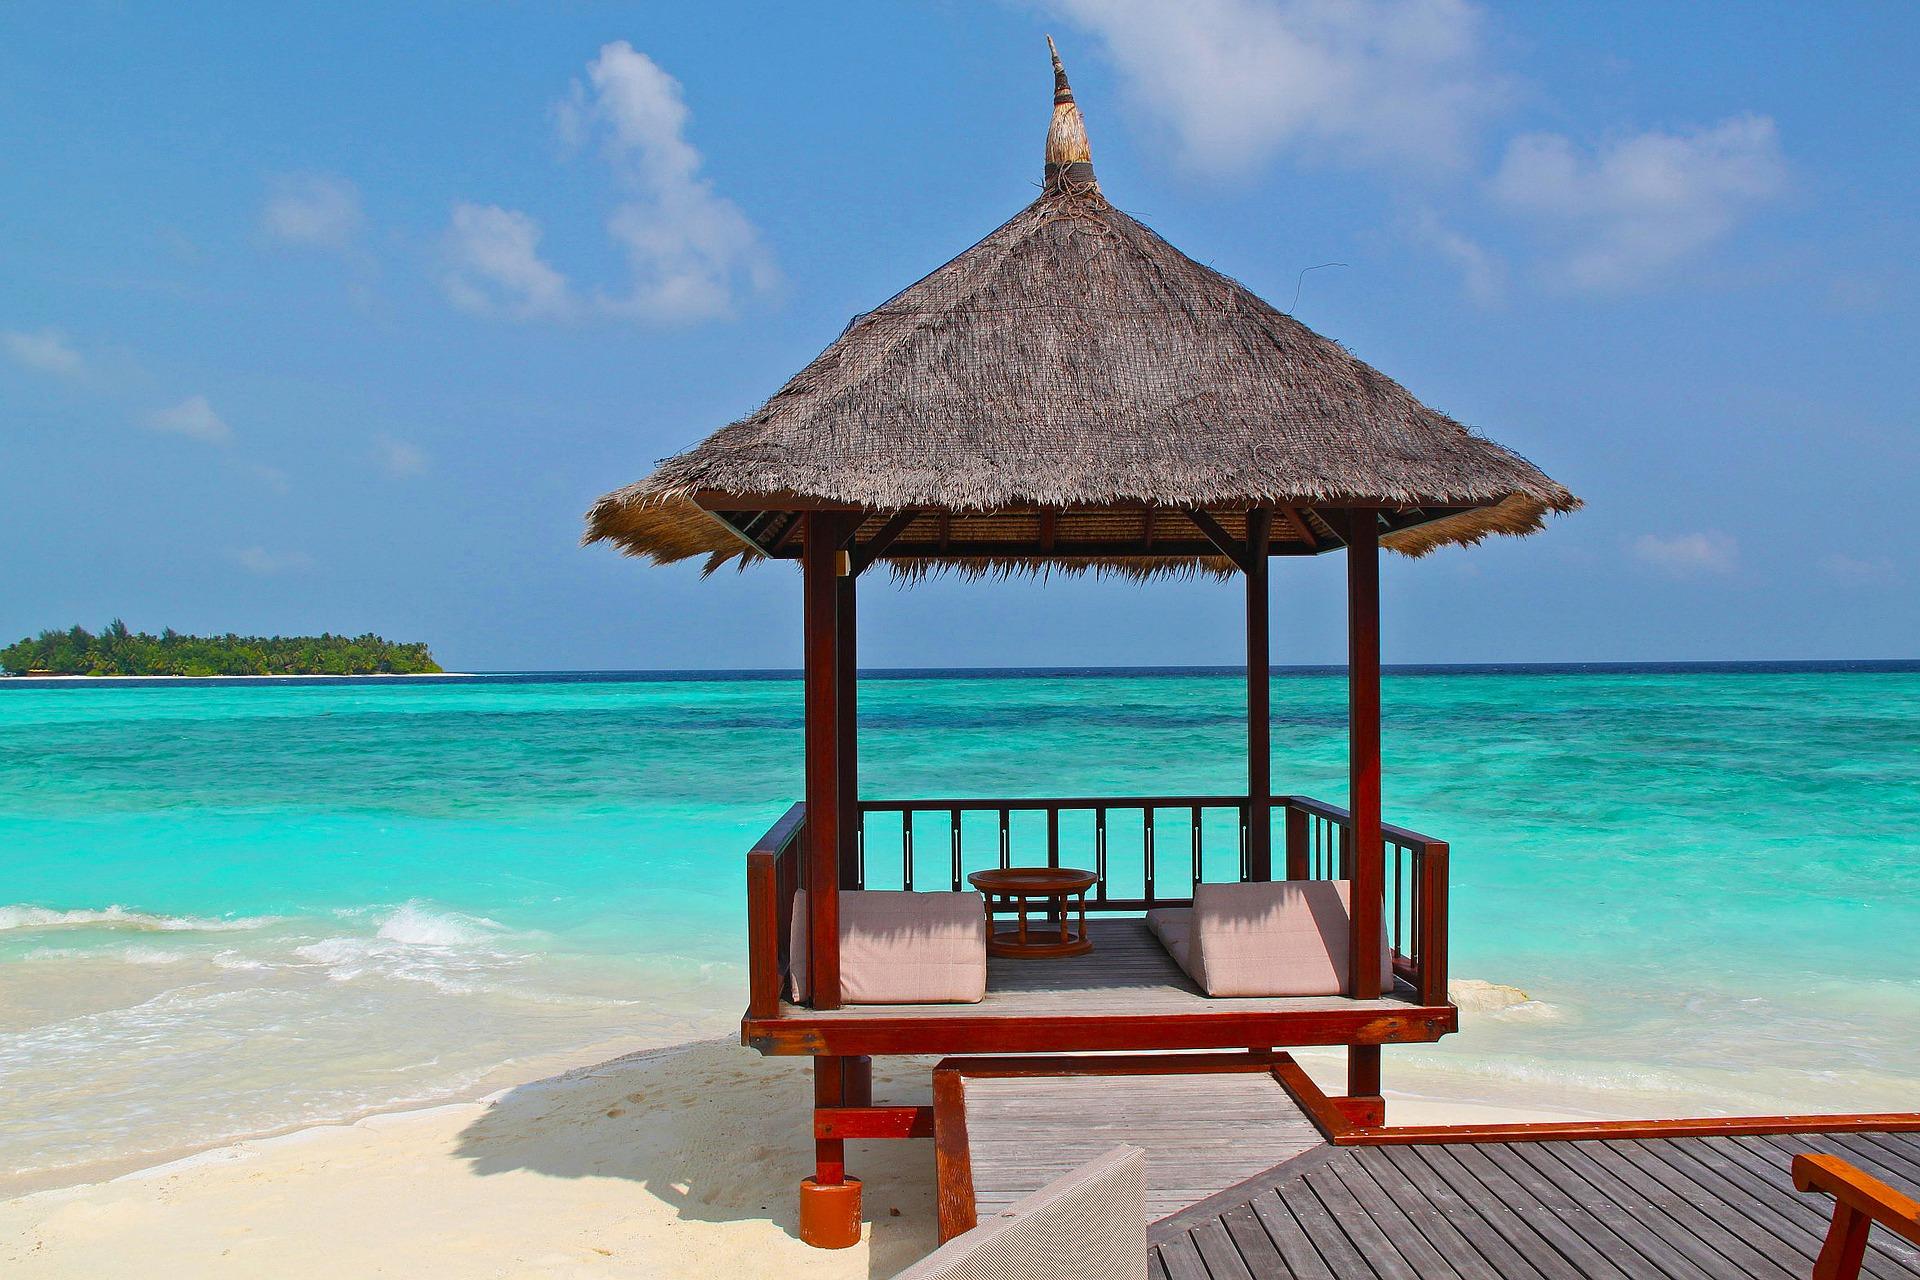 beach hut 237489 1920